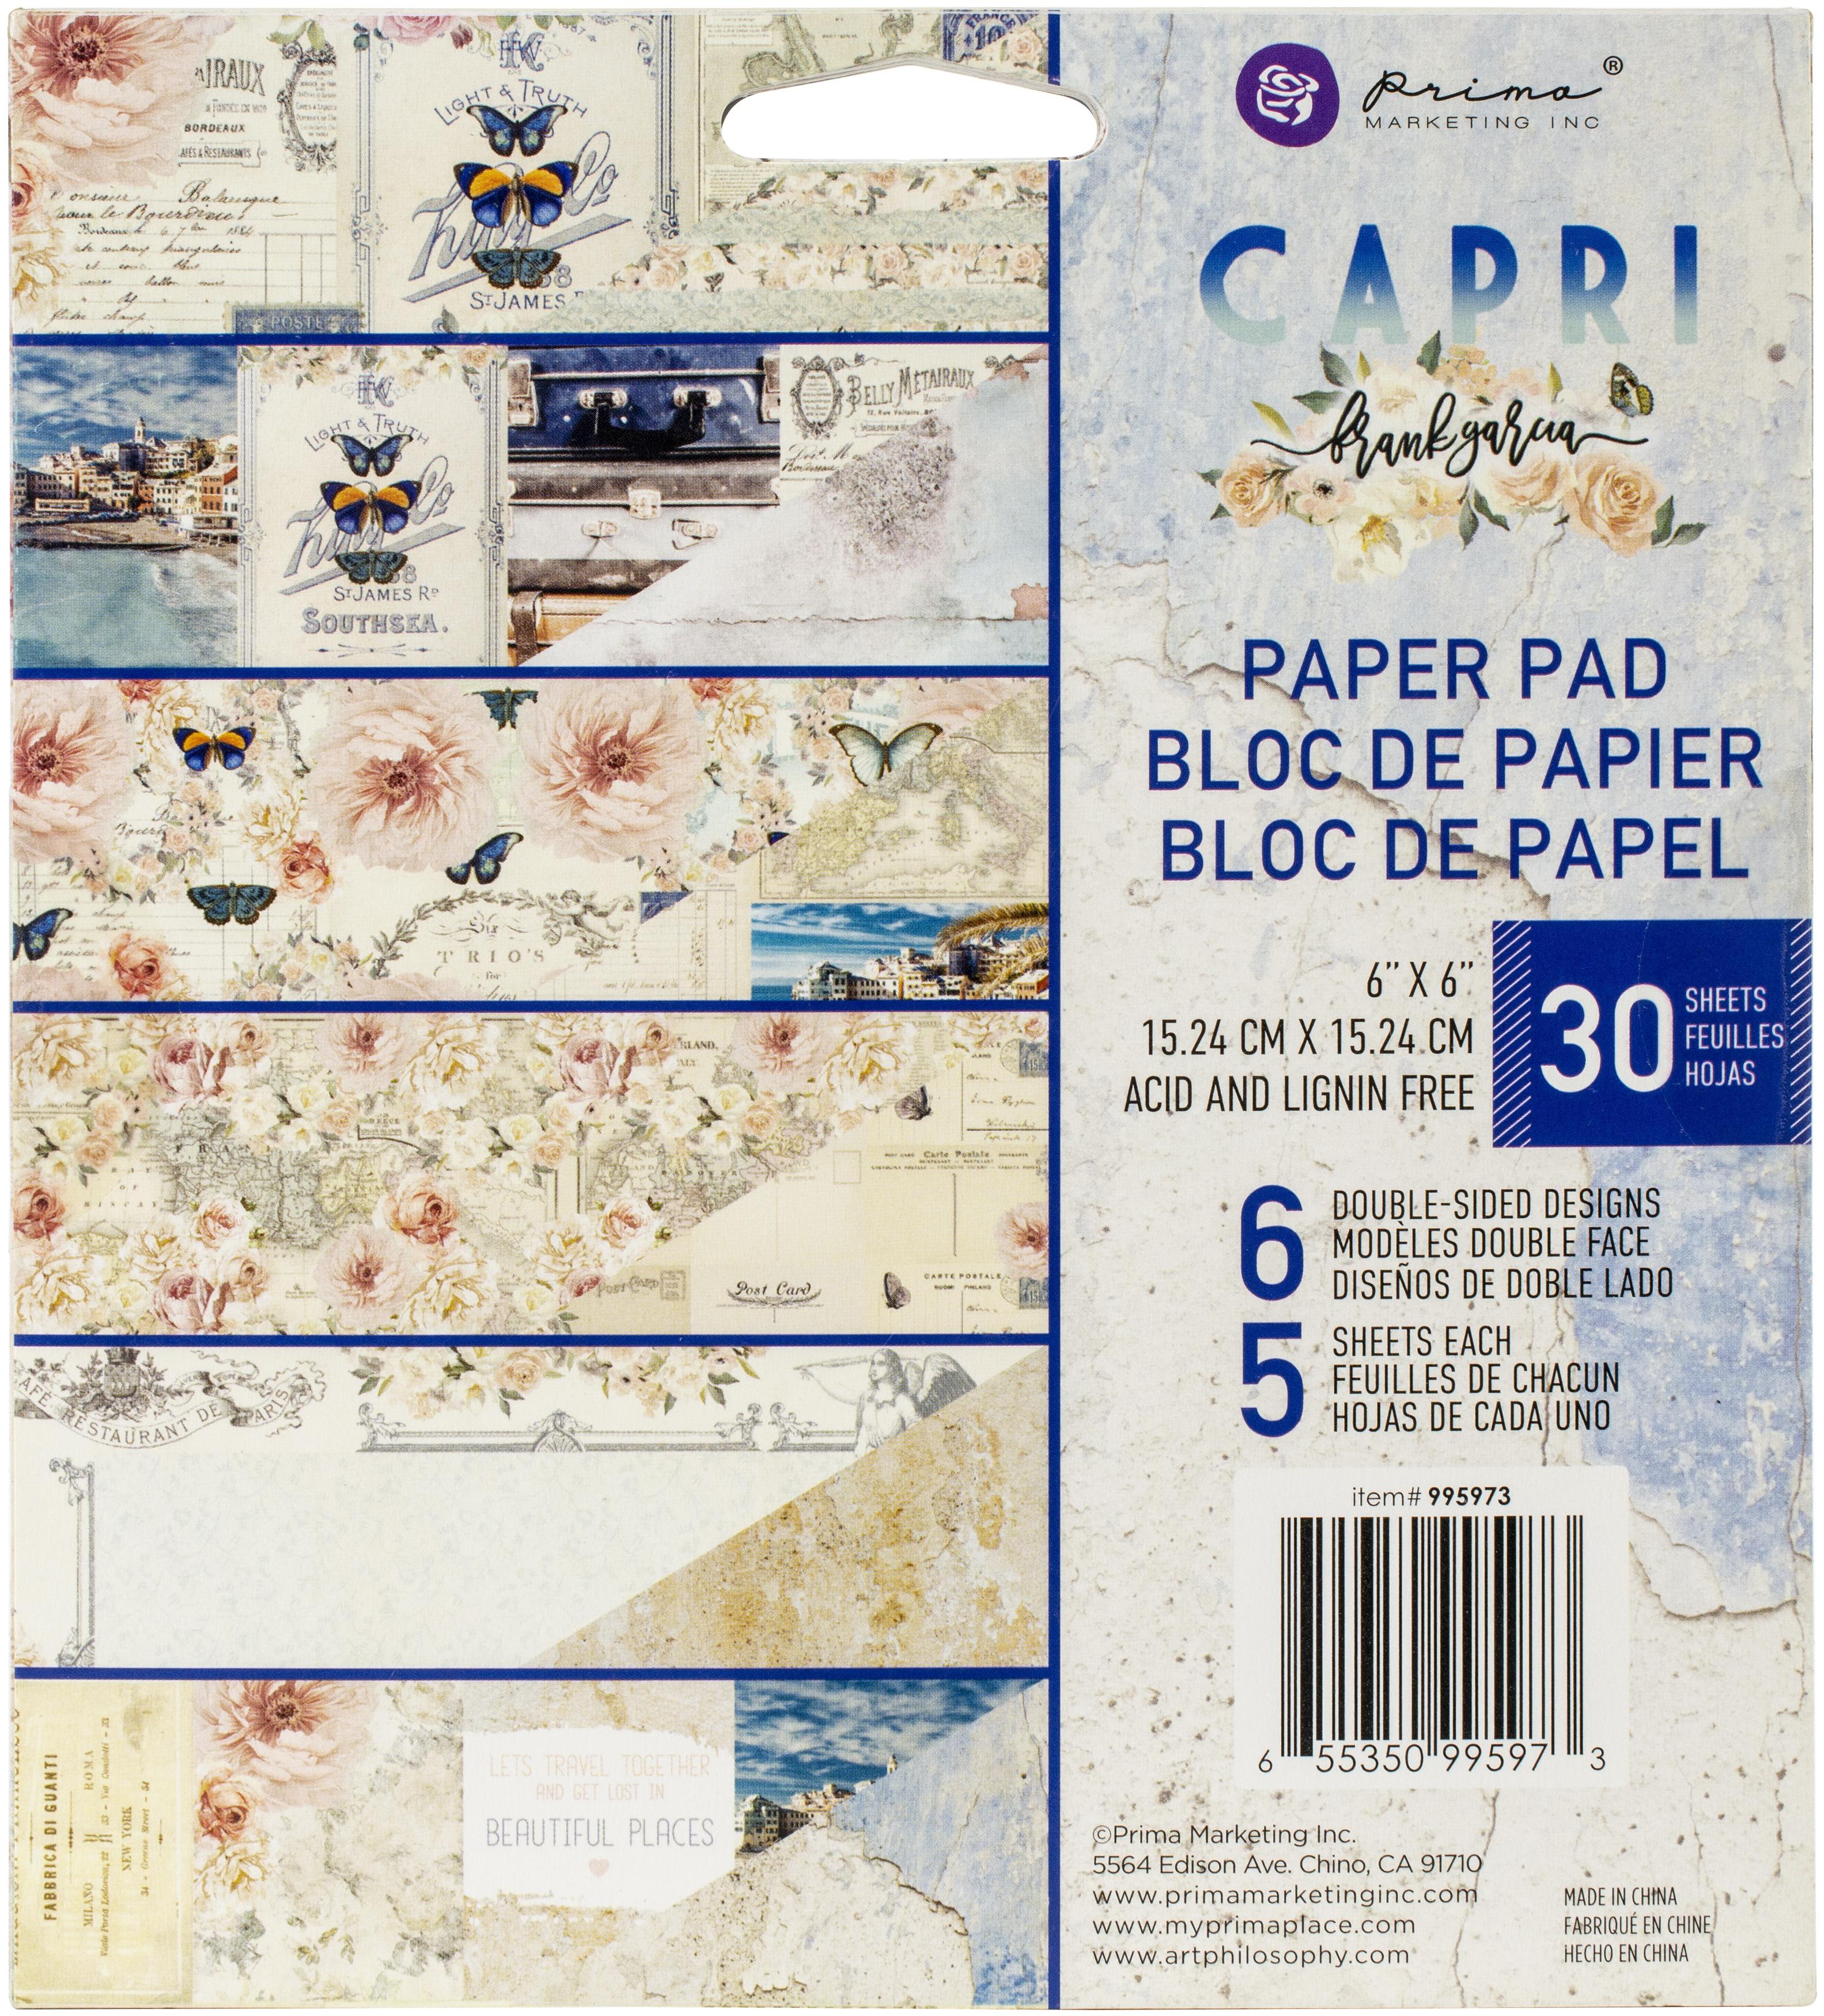 Prima Marketing Capri Paper Pad 6x6